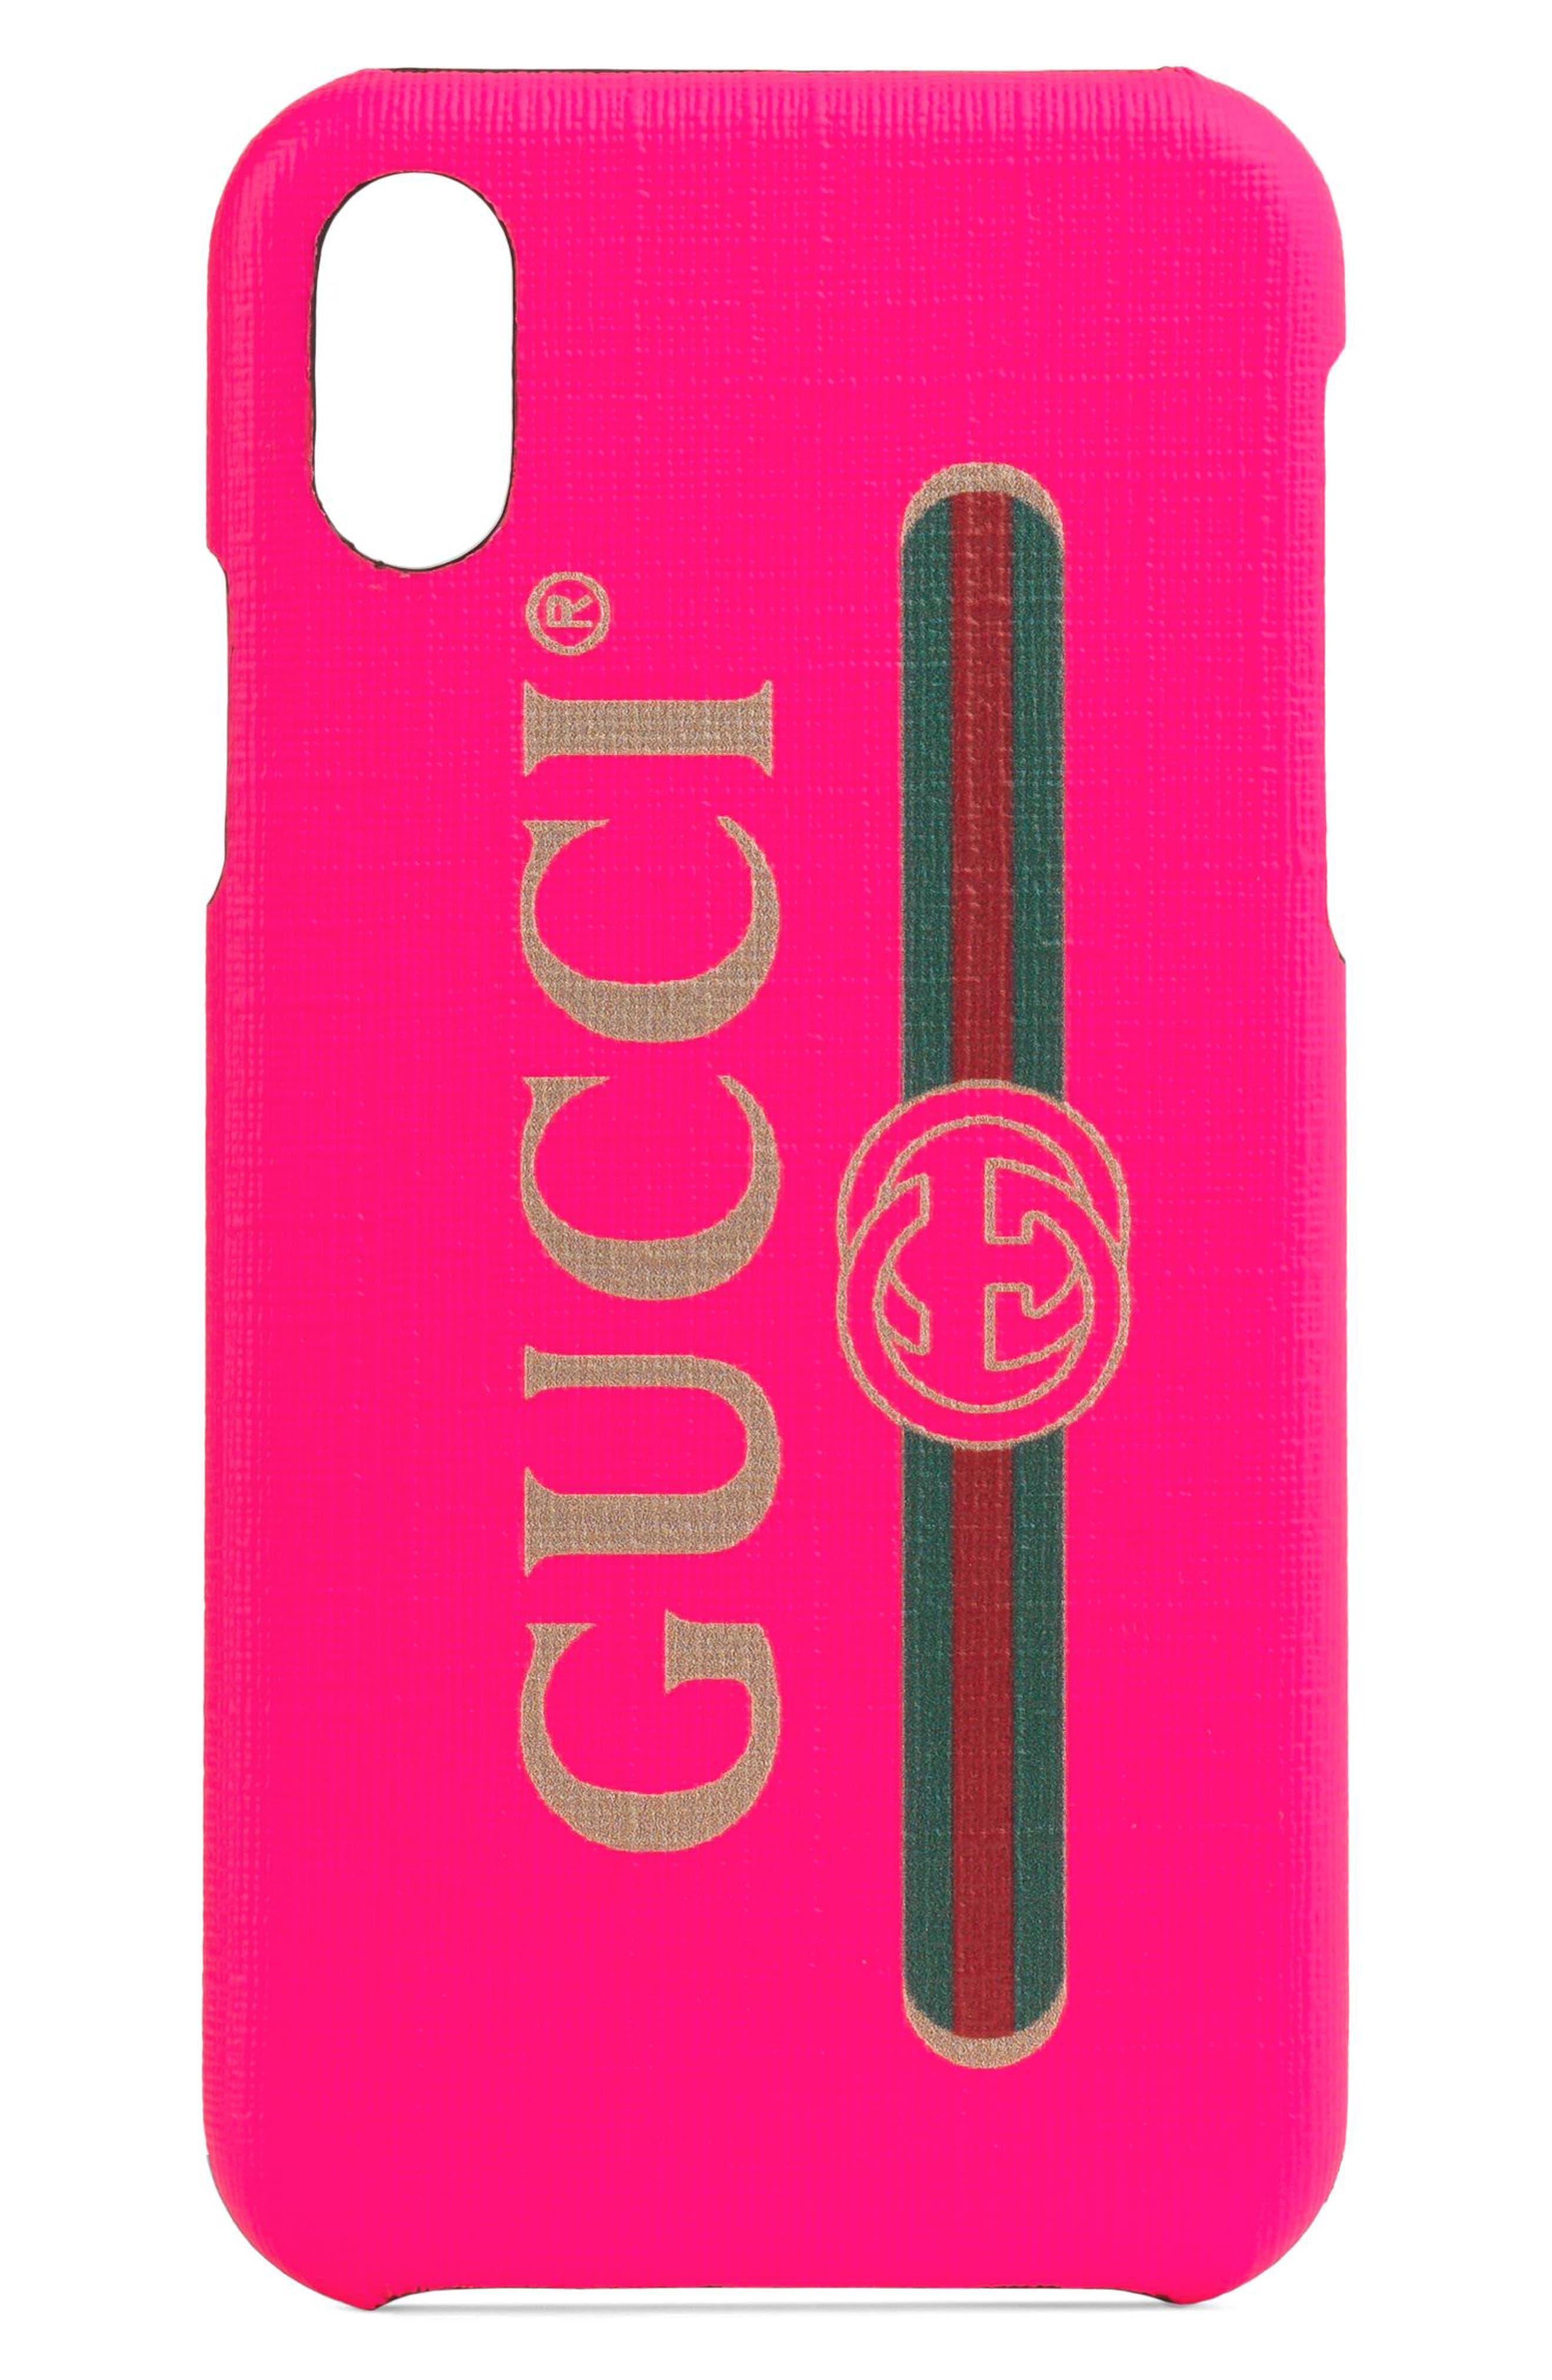 gucci cell phone casesBest Designer Iphone 8 Cases Latest Iphone 8 Cases Design Your Own Iphone 8 Case 8 Designer Cases Phone Cover Creator Gucci #20